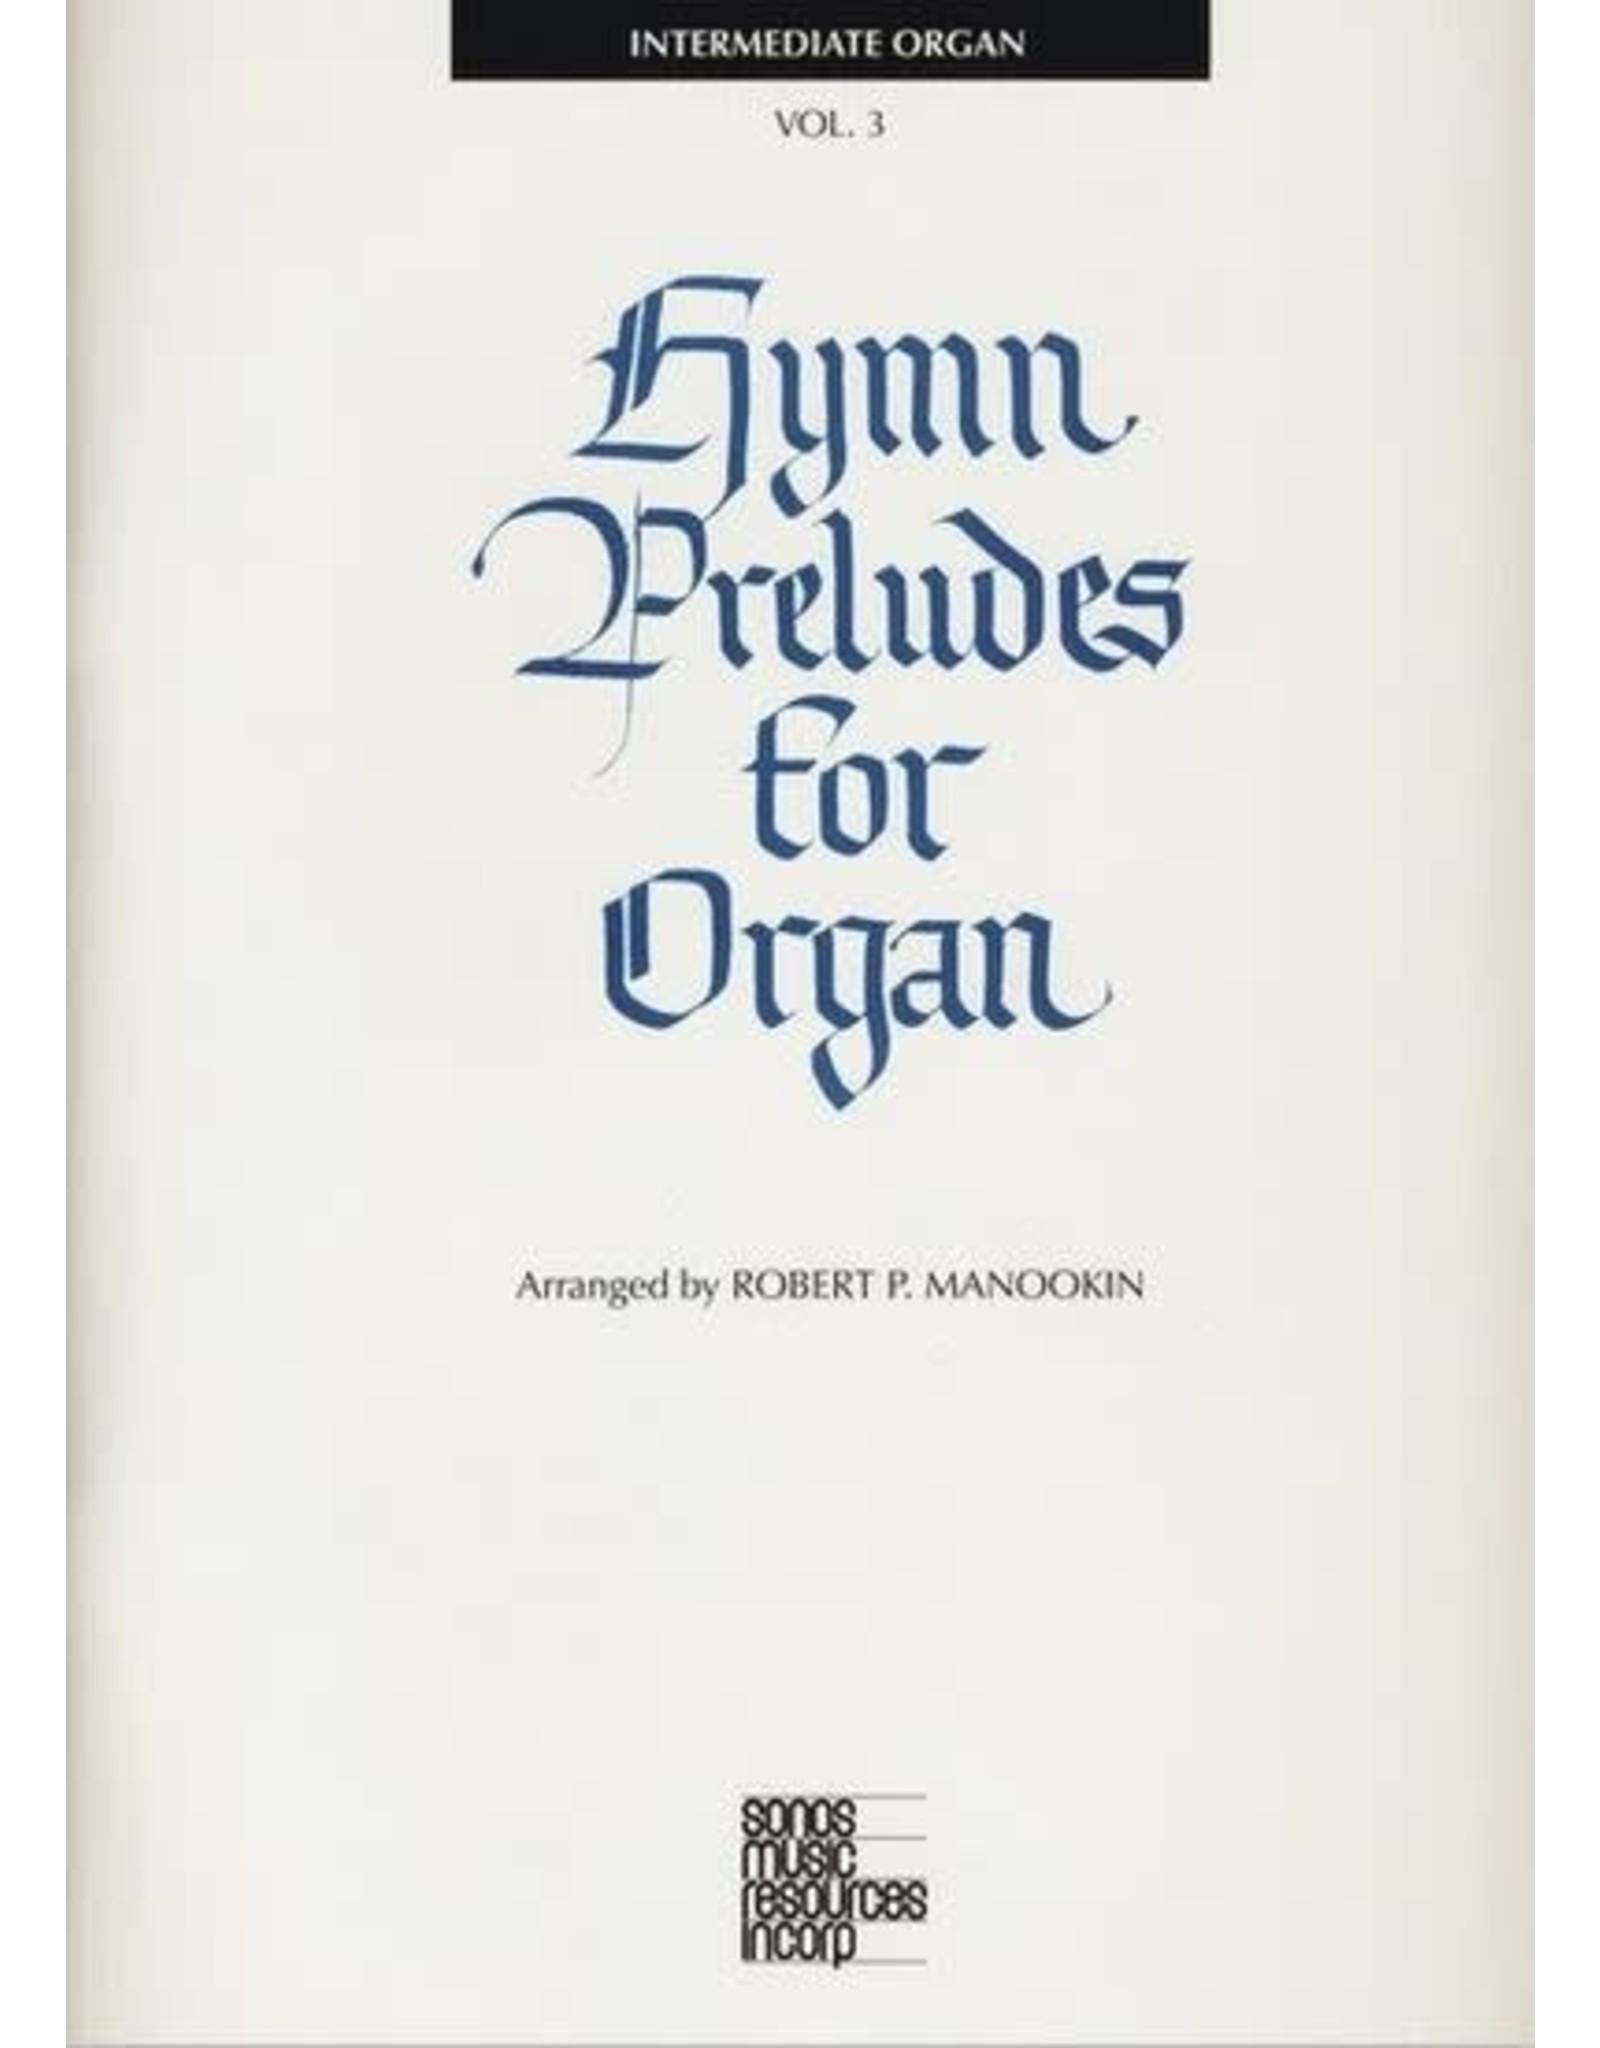 Jackman Music Hymn Preludes for Organ Book 3 arr. Robert P. Manookin